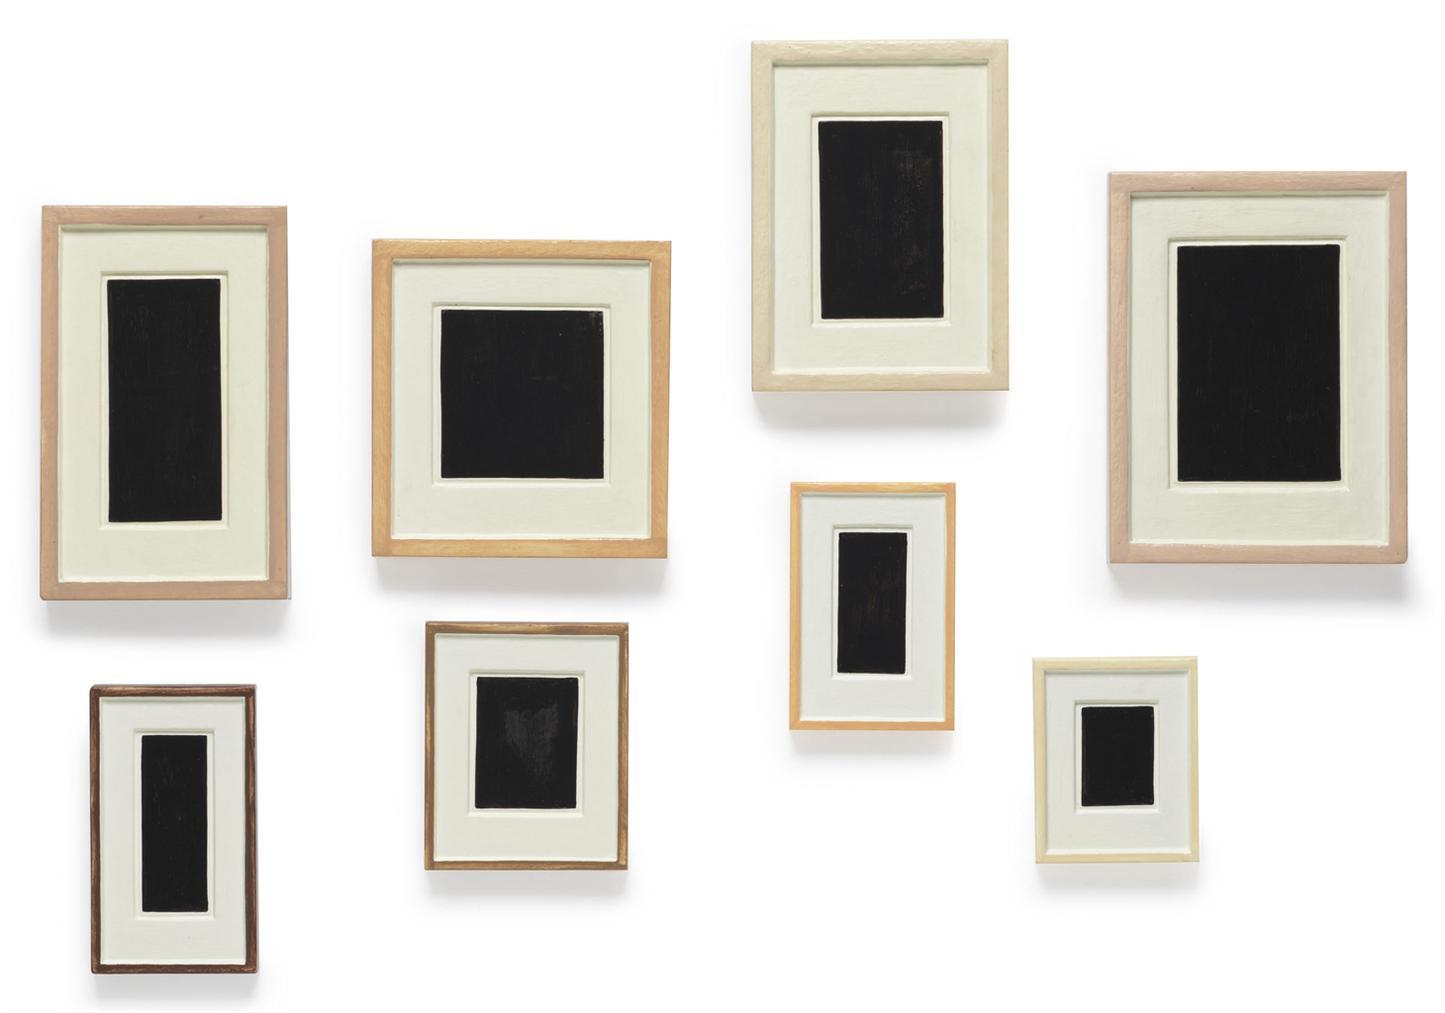 Allan McCollum-Collection Of Eight Plaster Surrogates-1985